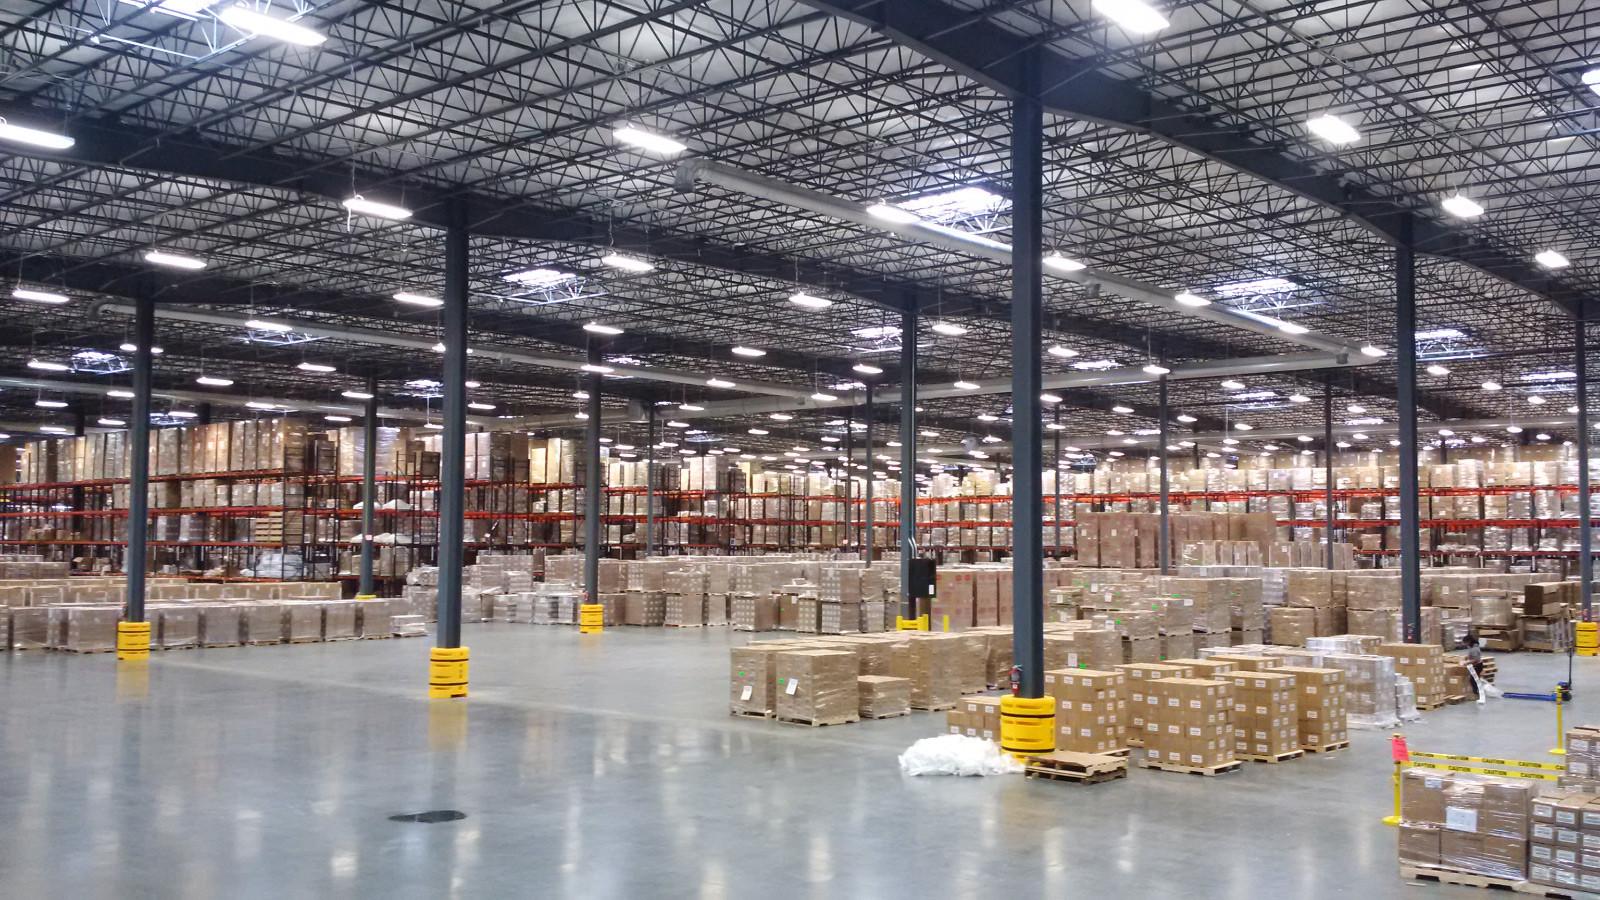 Perrigo Animal Health distribution center in La Vista Nebraska